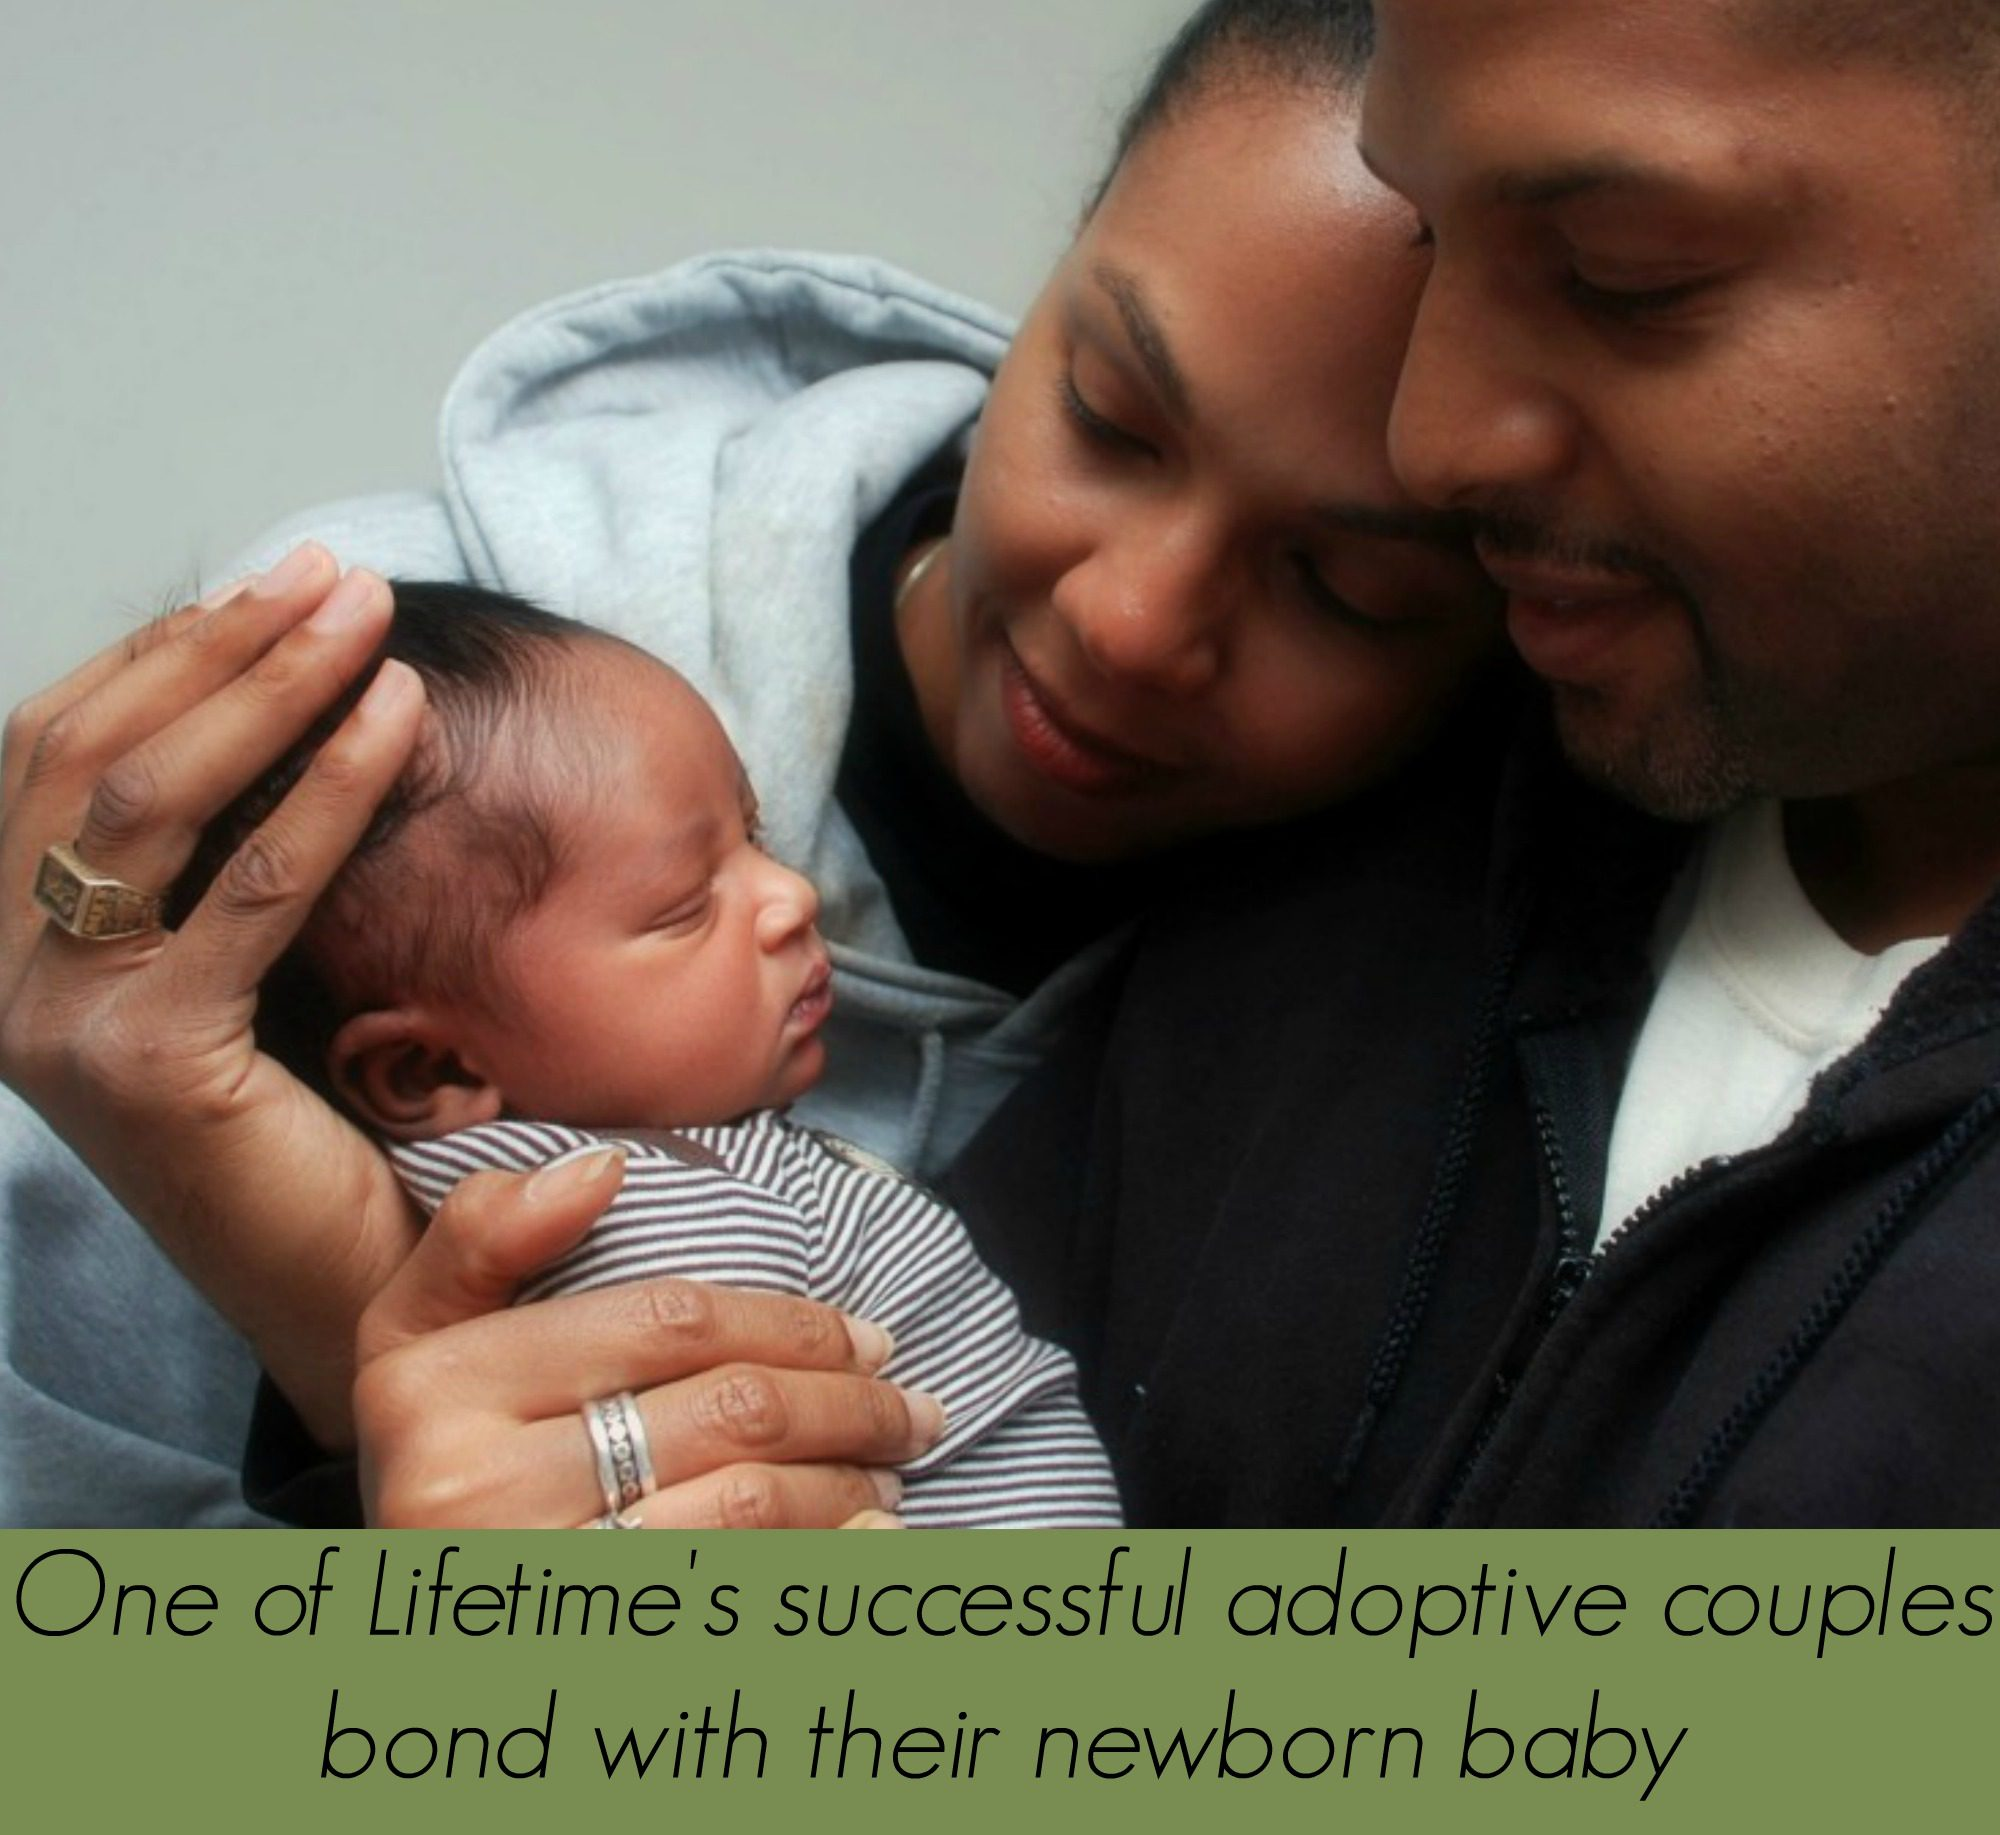 bonding_with_newborn-1.jpg